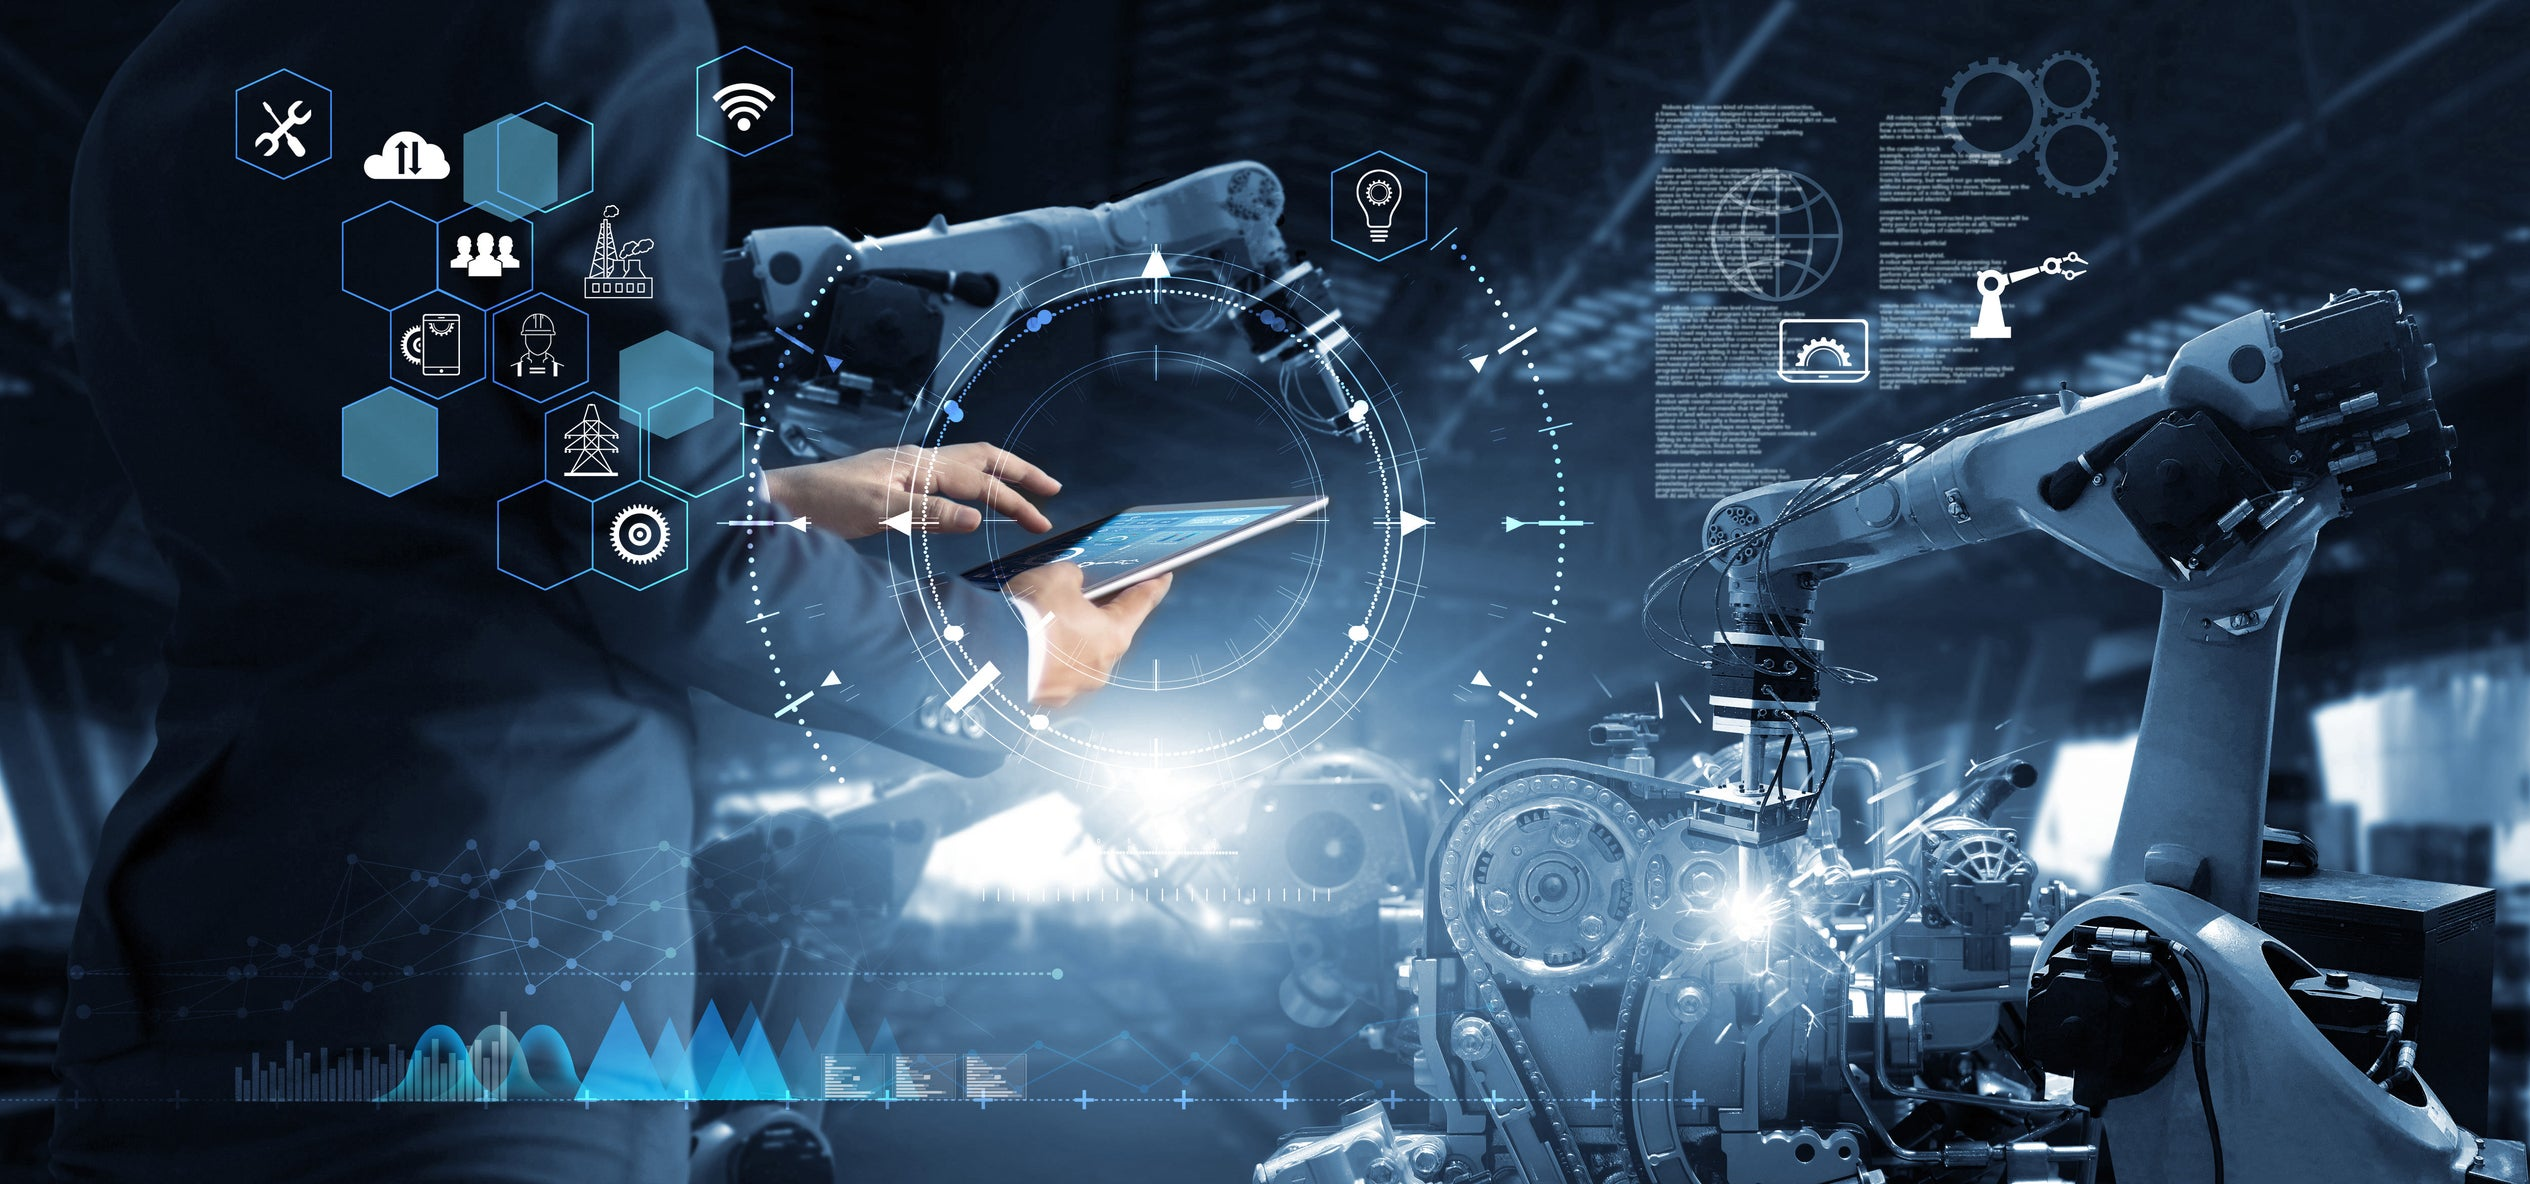 Robotics and the IoT